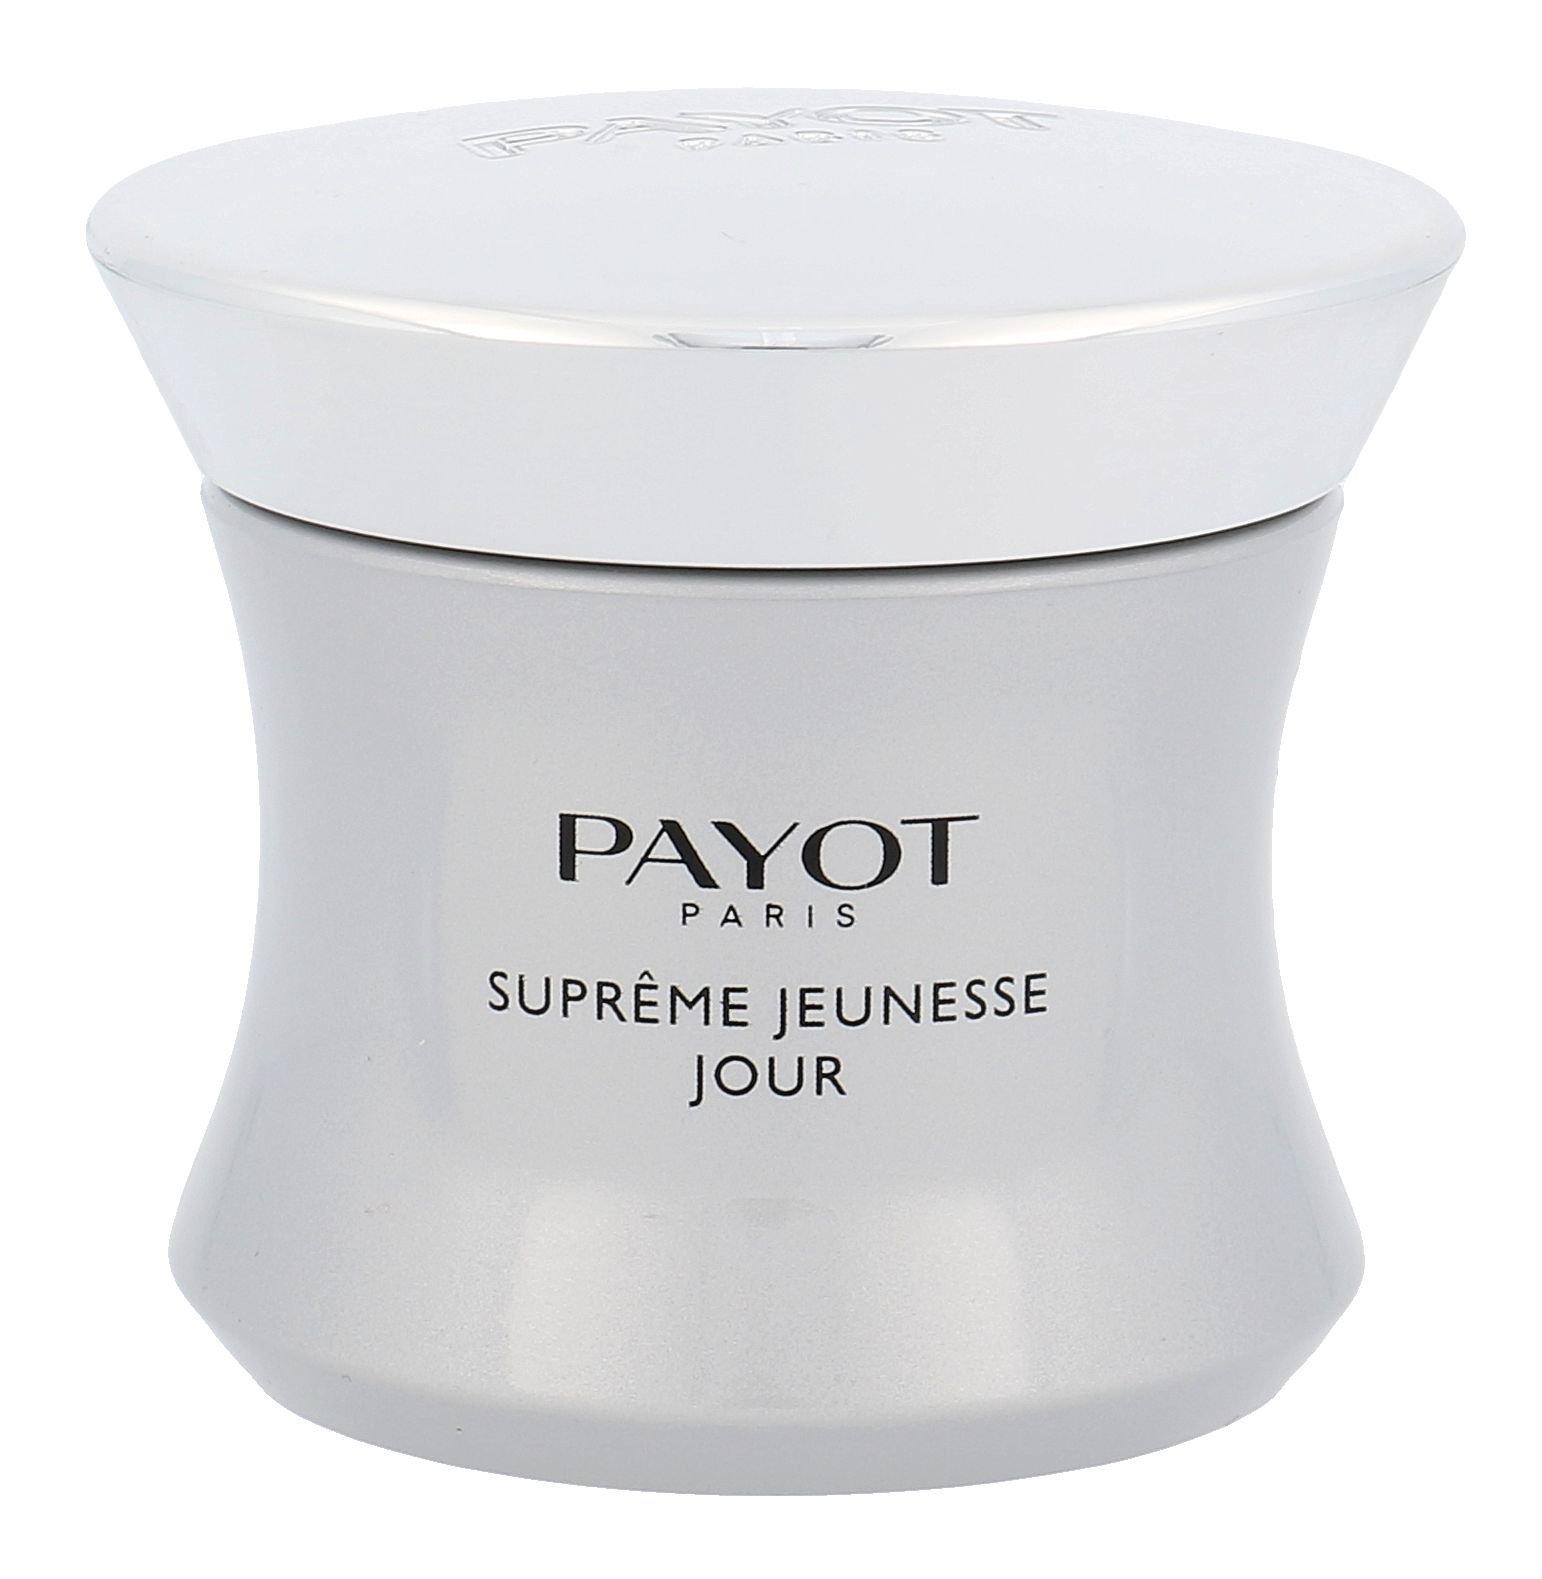 PAYOT Supreme Jeunesse Day Cream 50ml  Jour